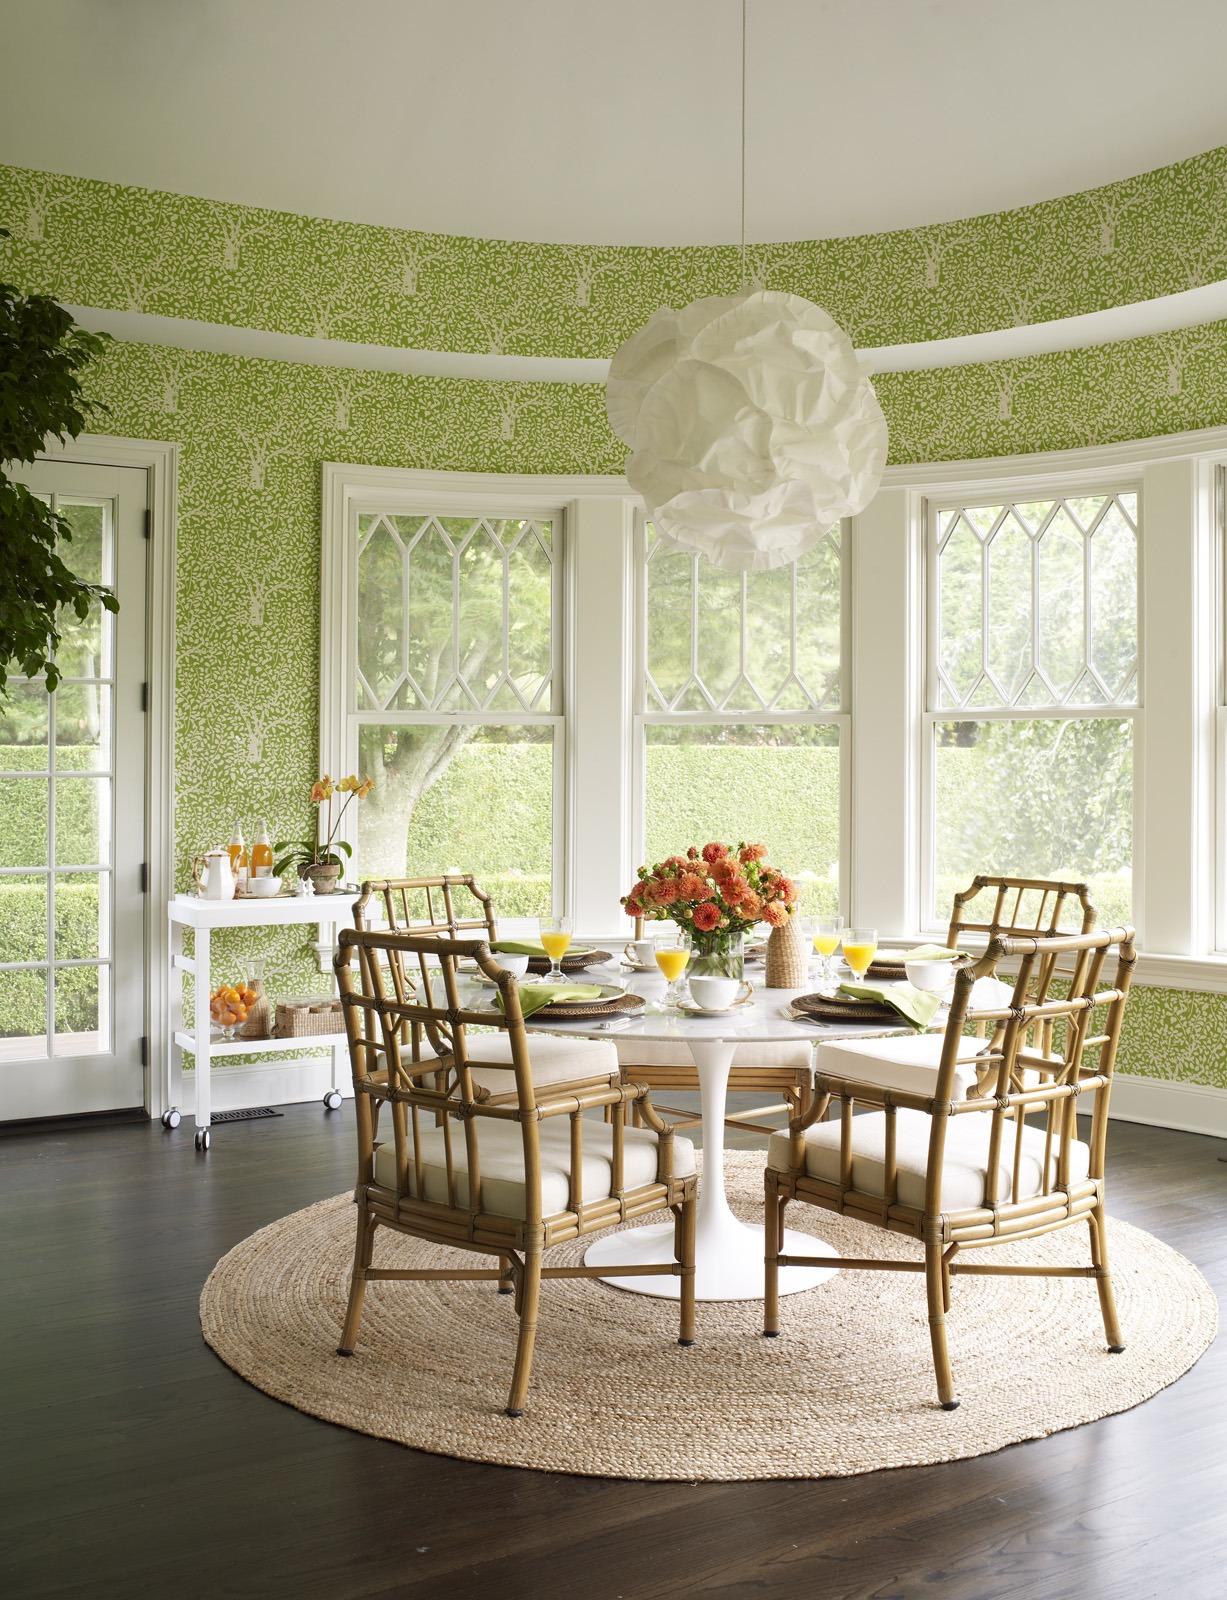 Meg Braff Designs Southampton home breakfast room